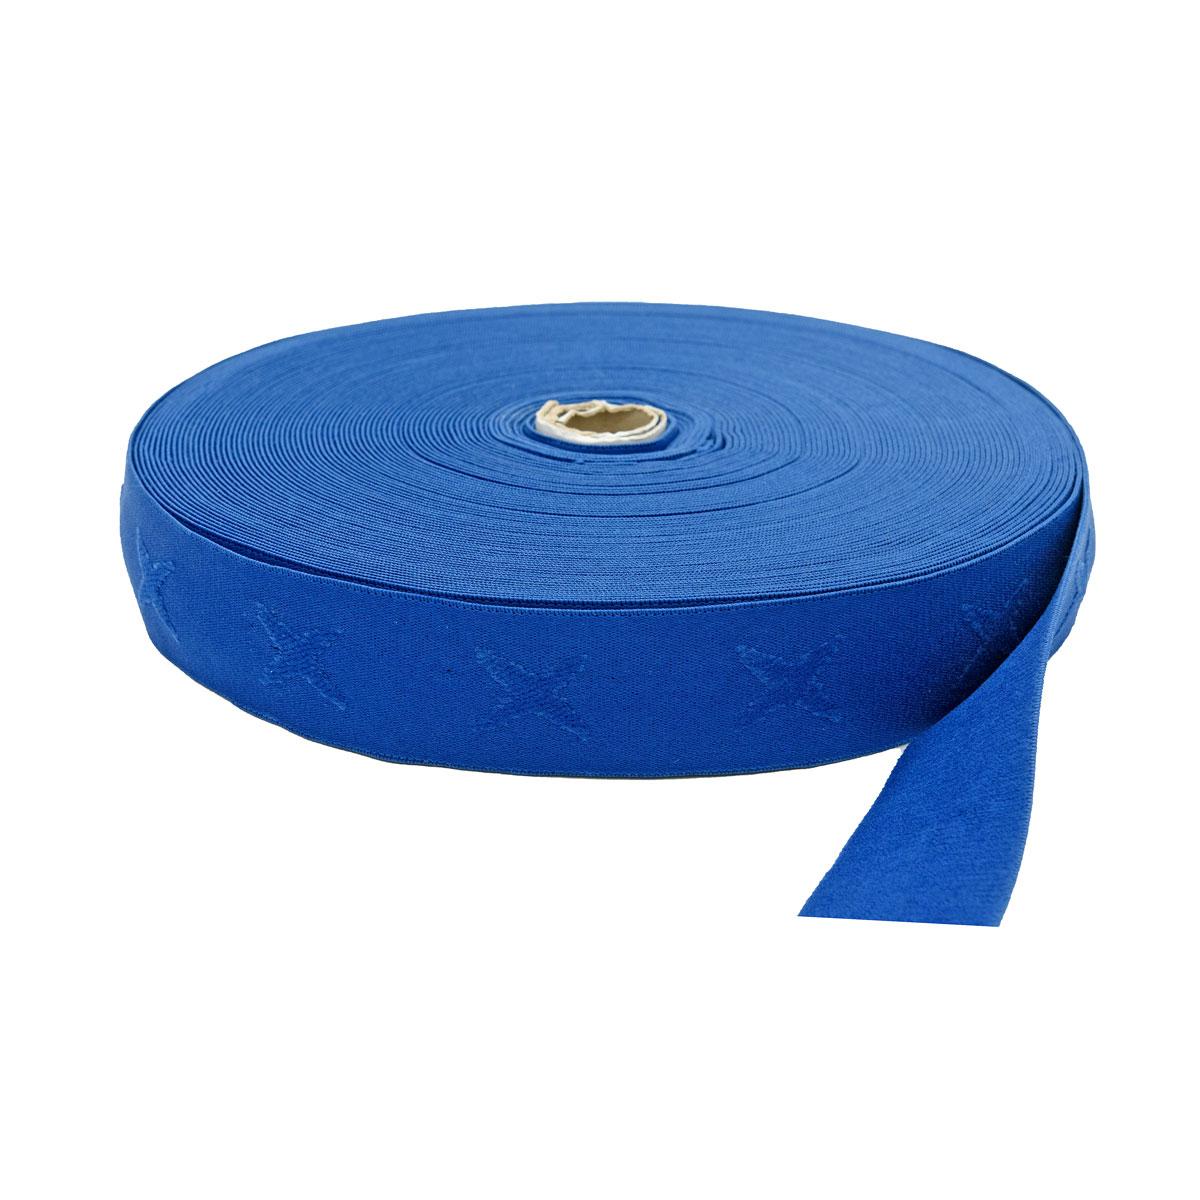 46-01971/35 Резинка ткан. 35мм